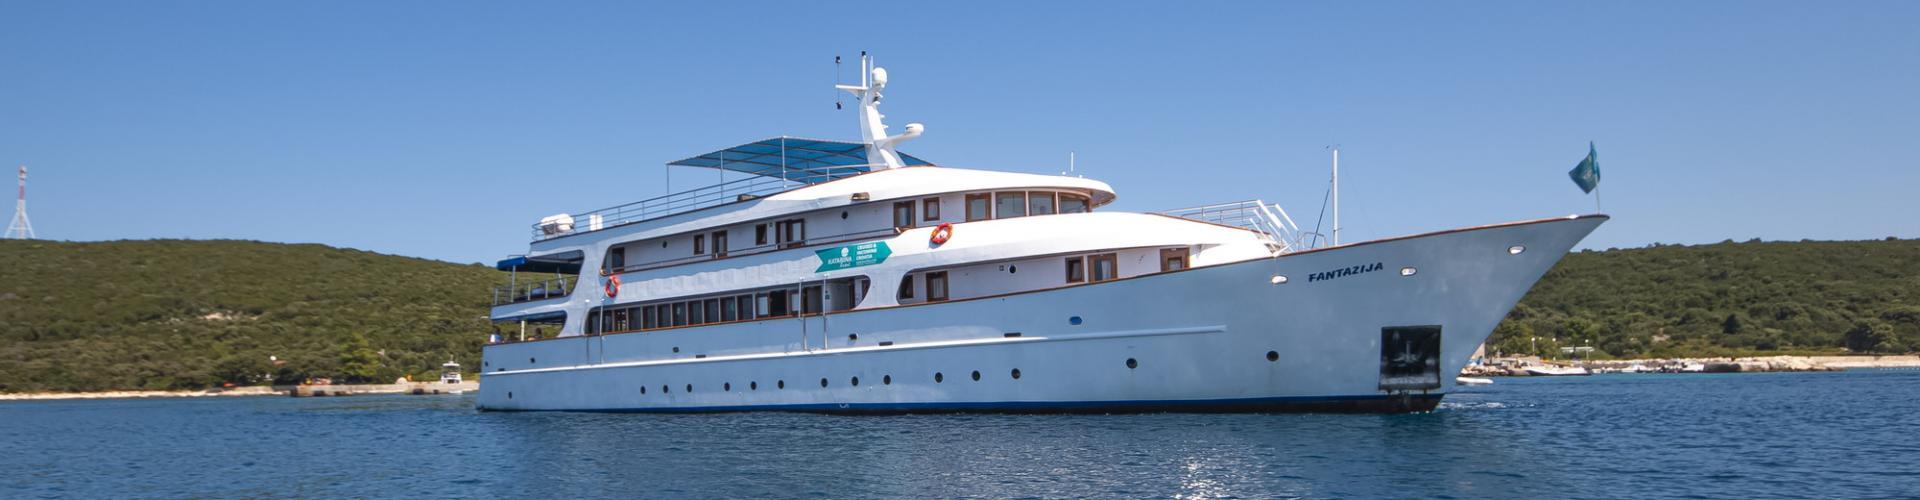 Deluxe cruiser MV Fantazija- motor yacht